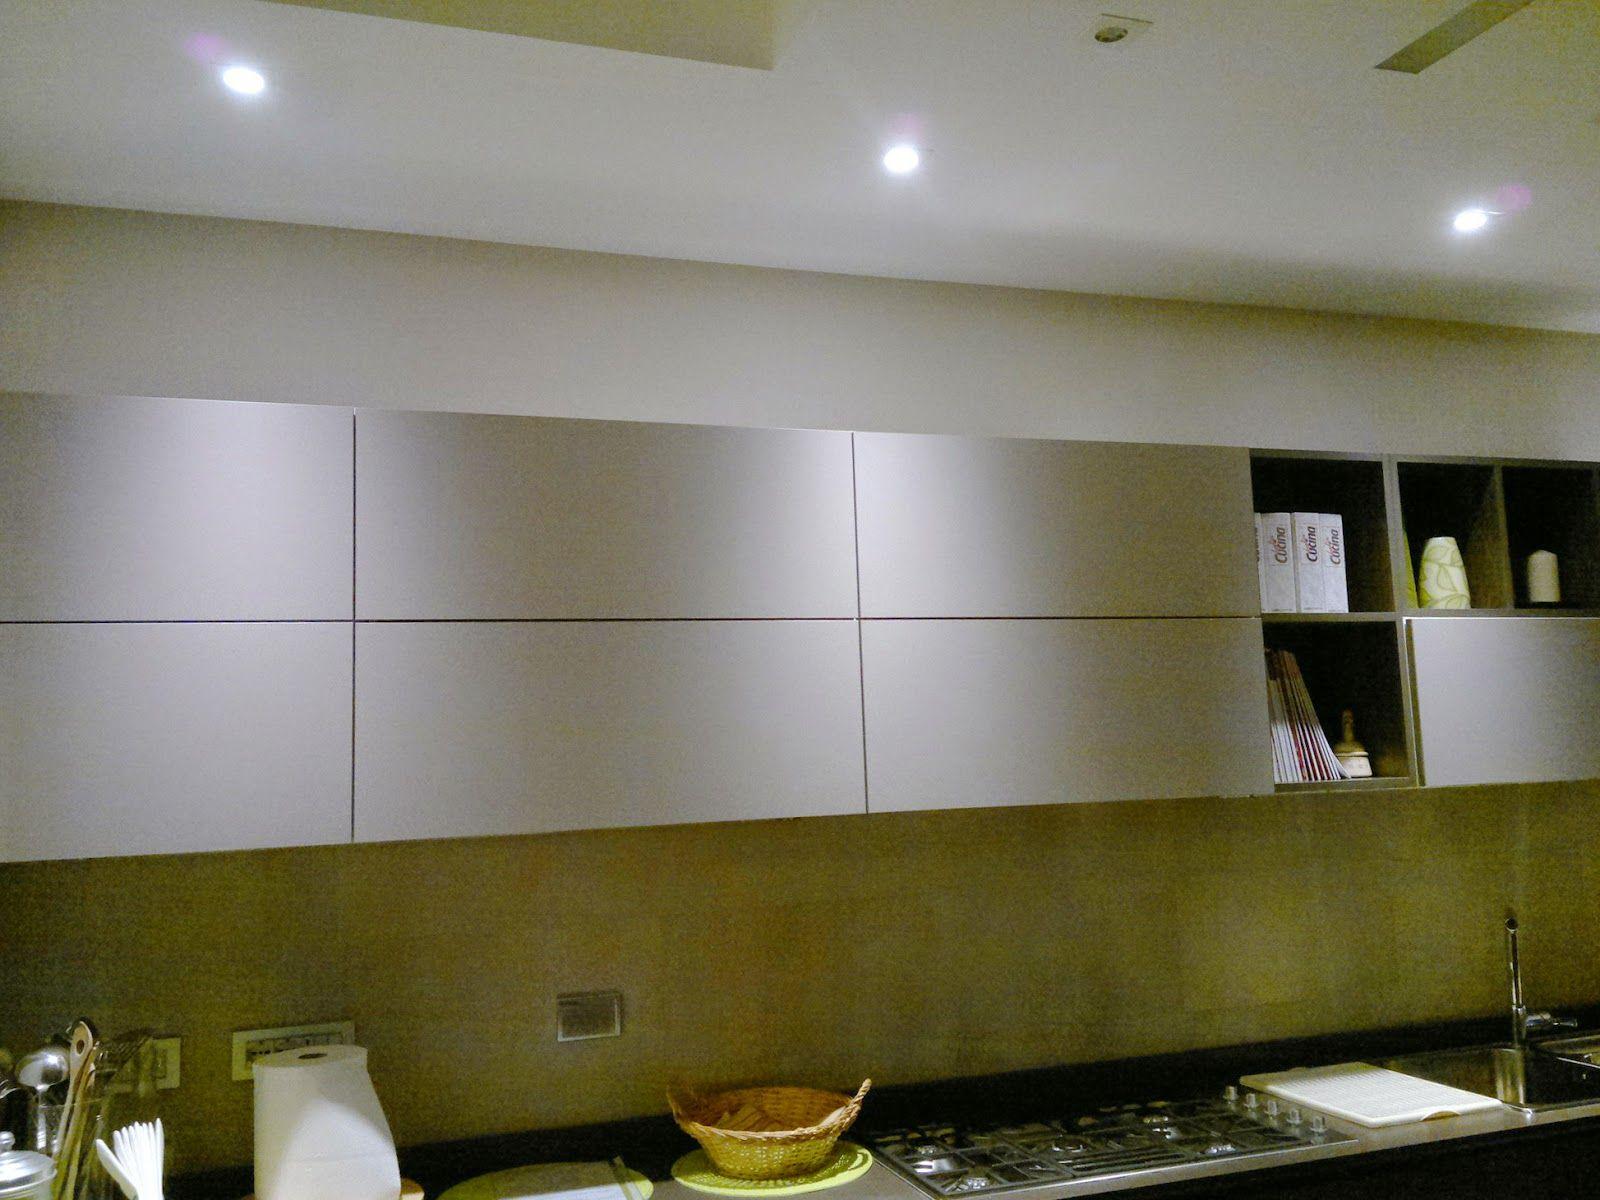 Illuminazione Led Cucina | Lampade A Led Per Sottopensili Cucina Lampada